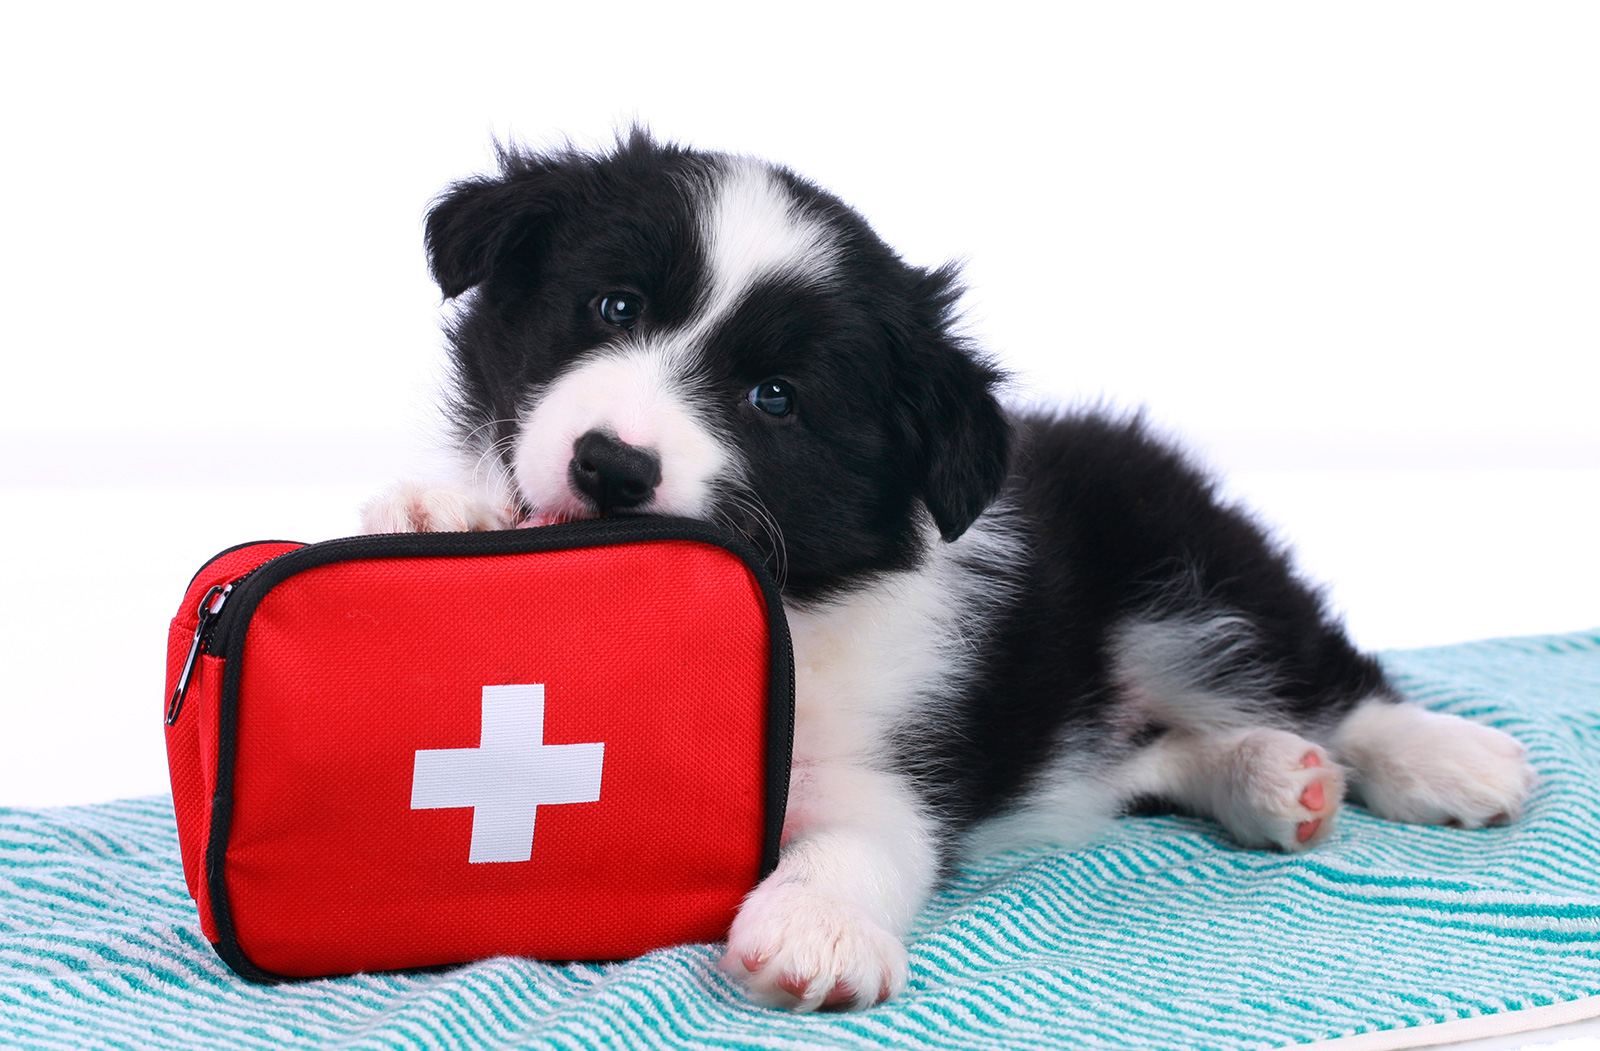 Primeros auxilios para animales de compañia